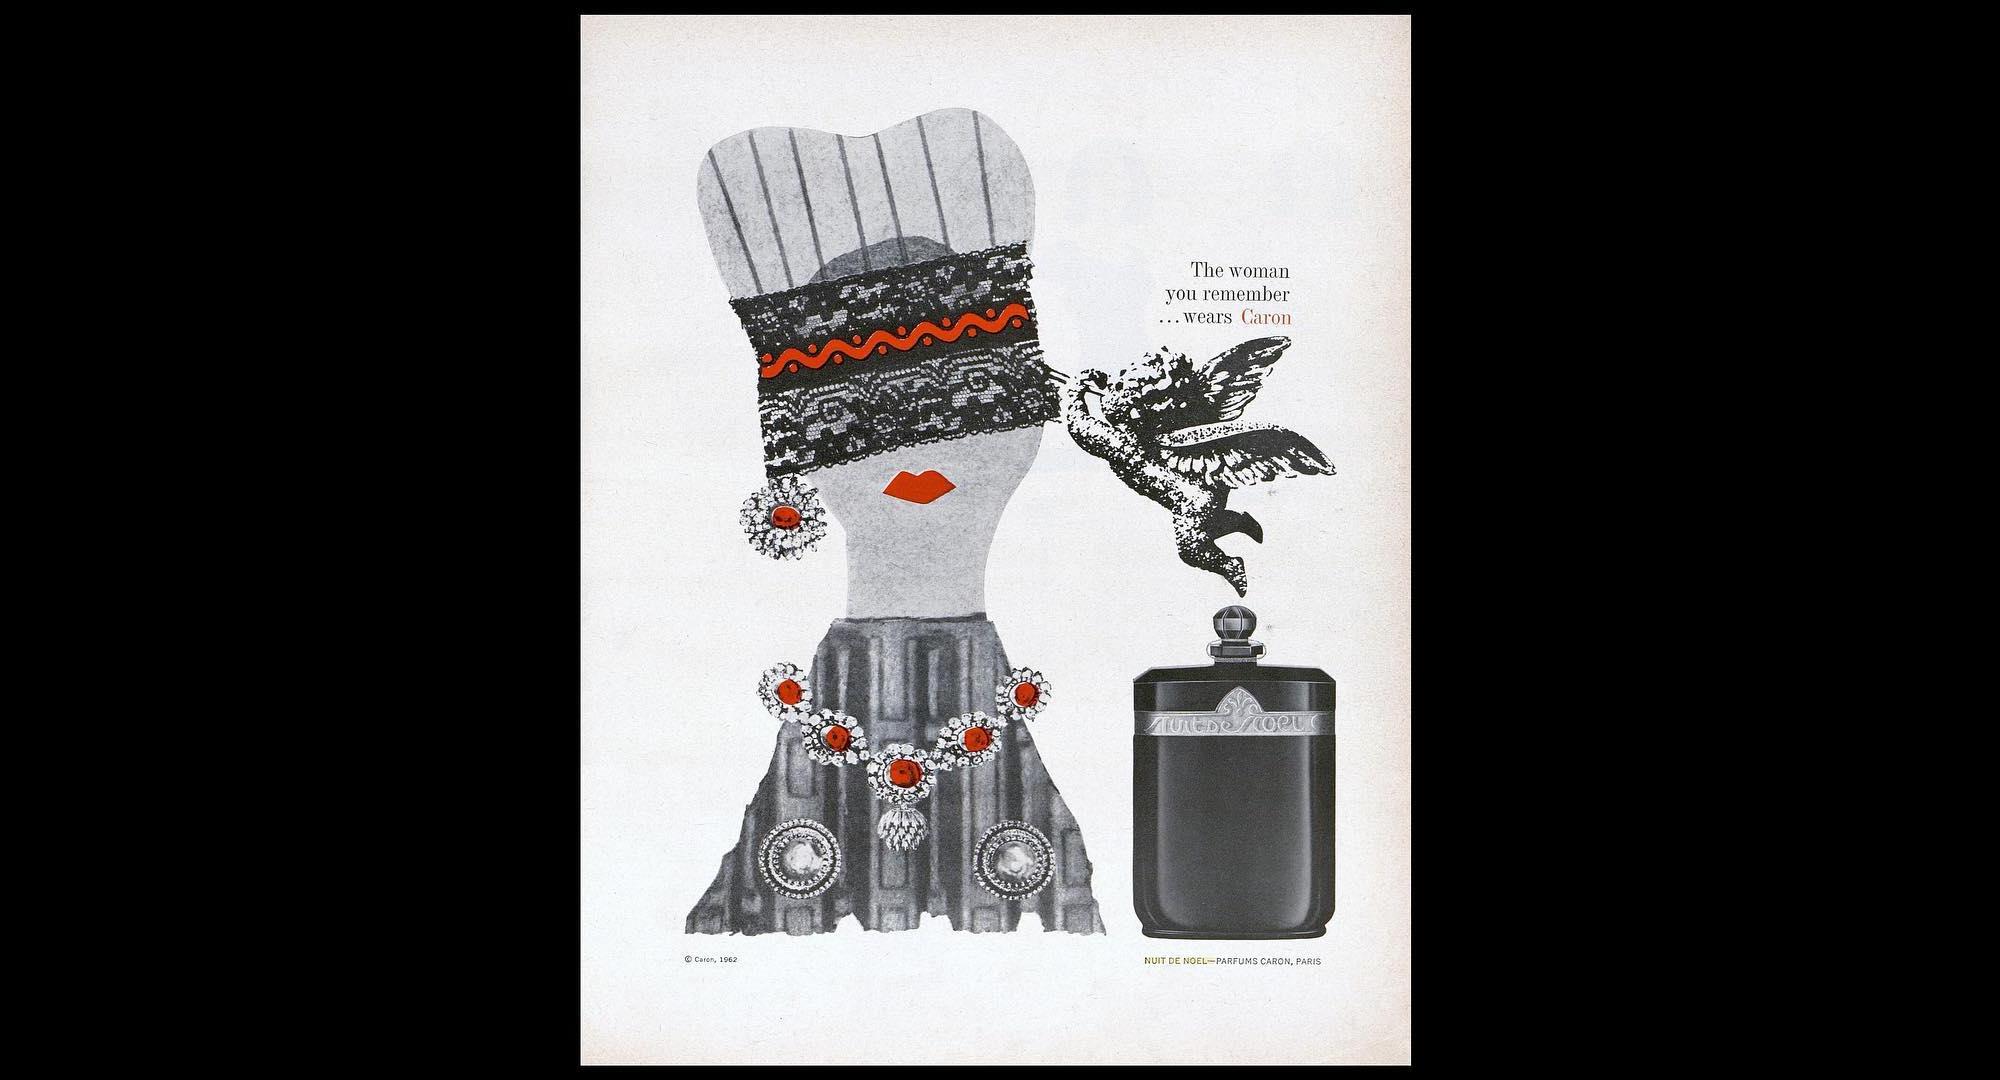 Caron Nuit de Noel - reklama z 1962 roku